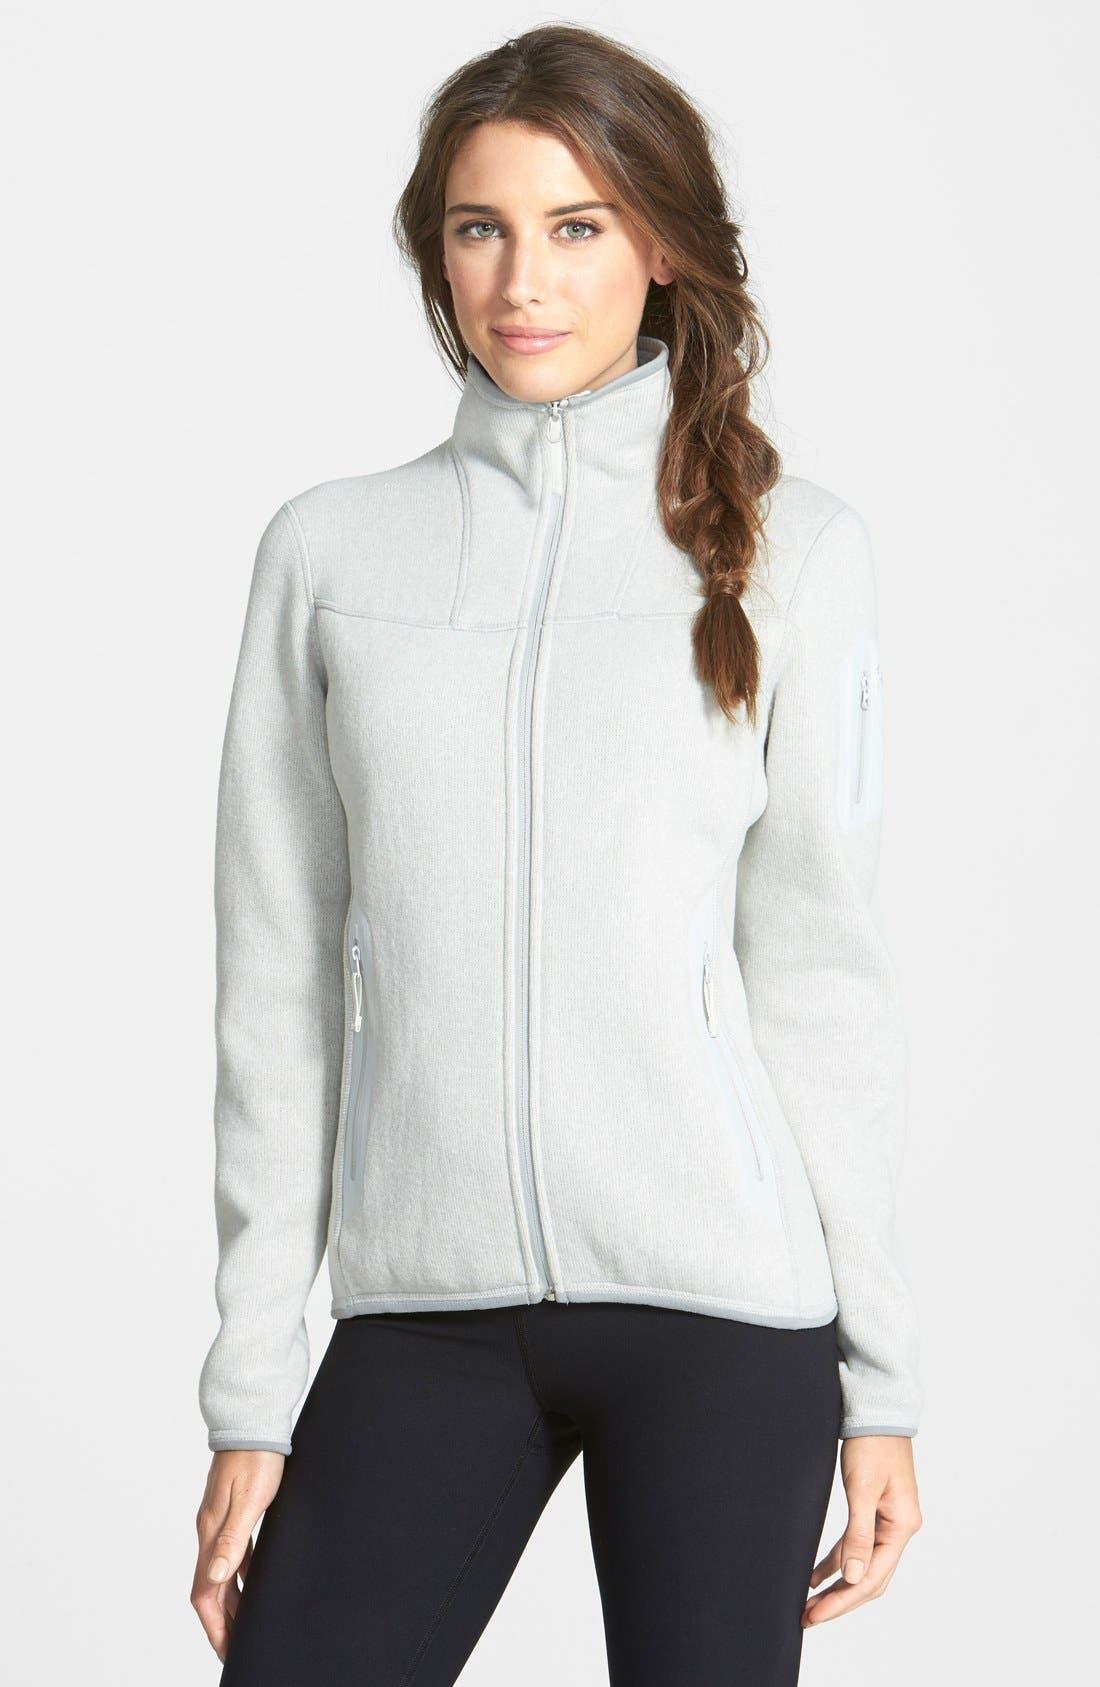 Alternate Image 1 Selected - Arc'teryx Covert Cardigan Fleece Jacket